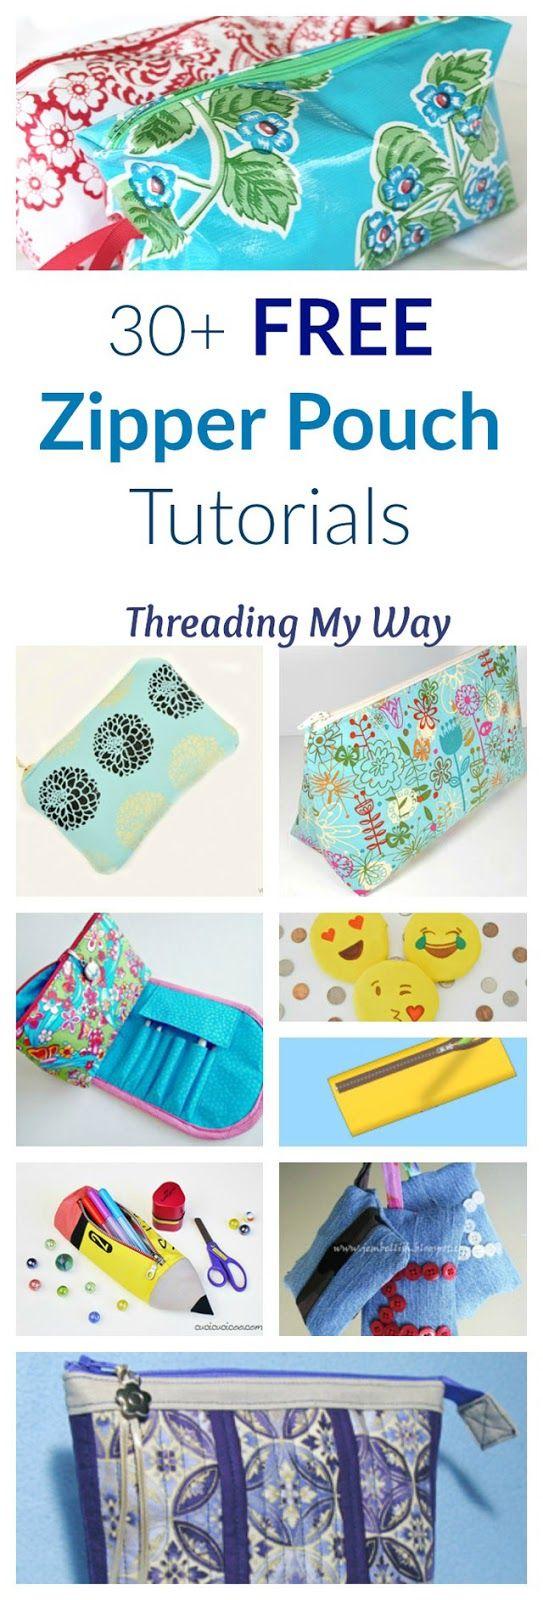 Threading My Way: 30+ FREE Zippered Pouch Tutorials